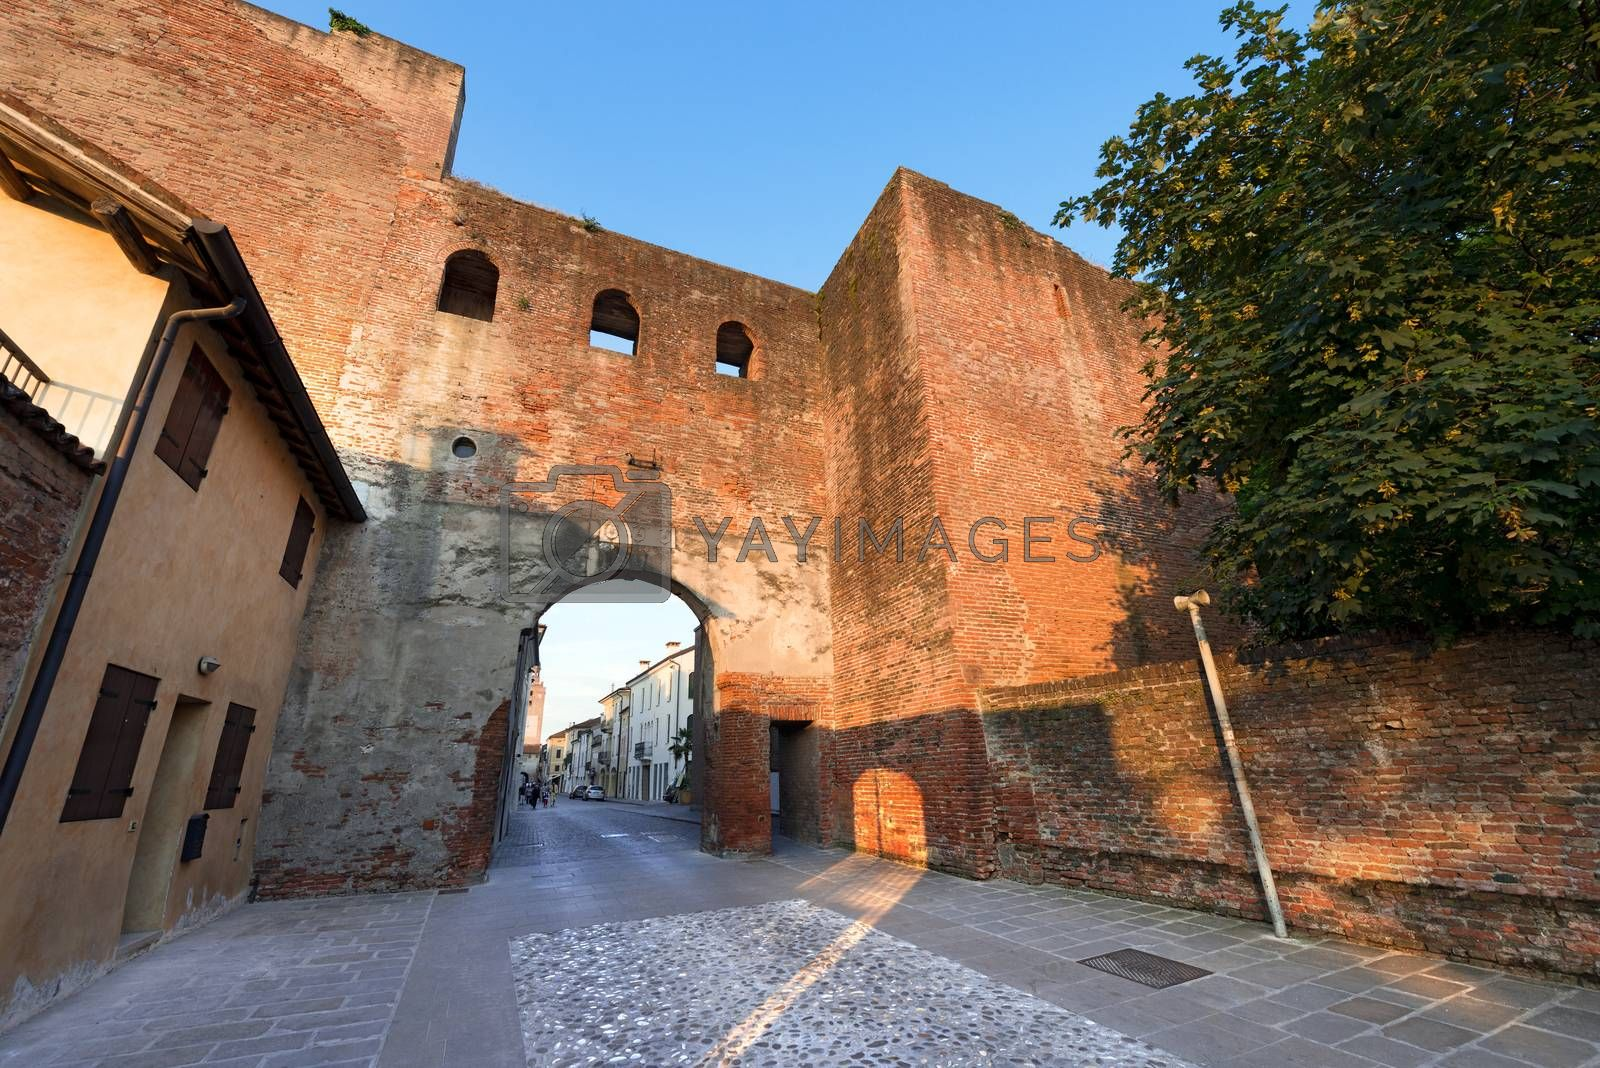 Porta del Musile - Castelfranco Veneto - Italy by catalby